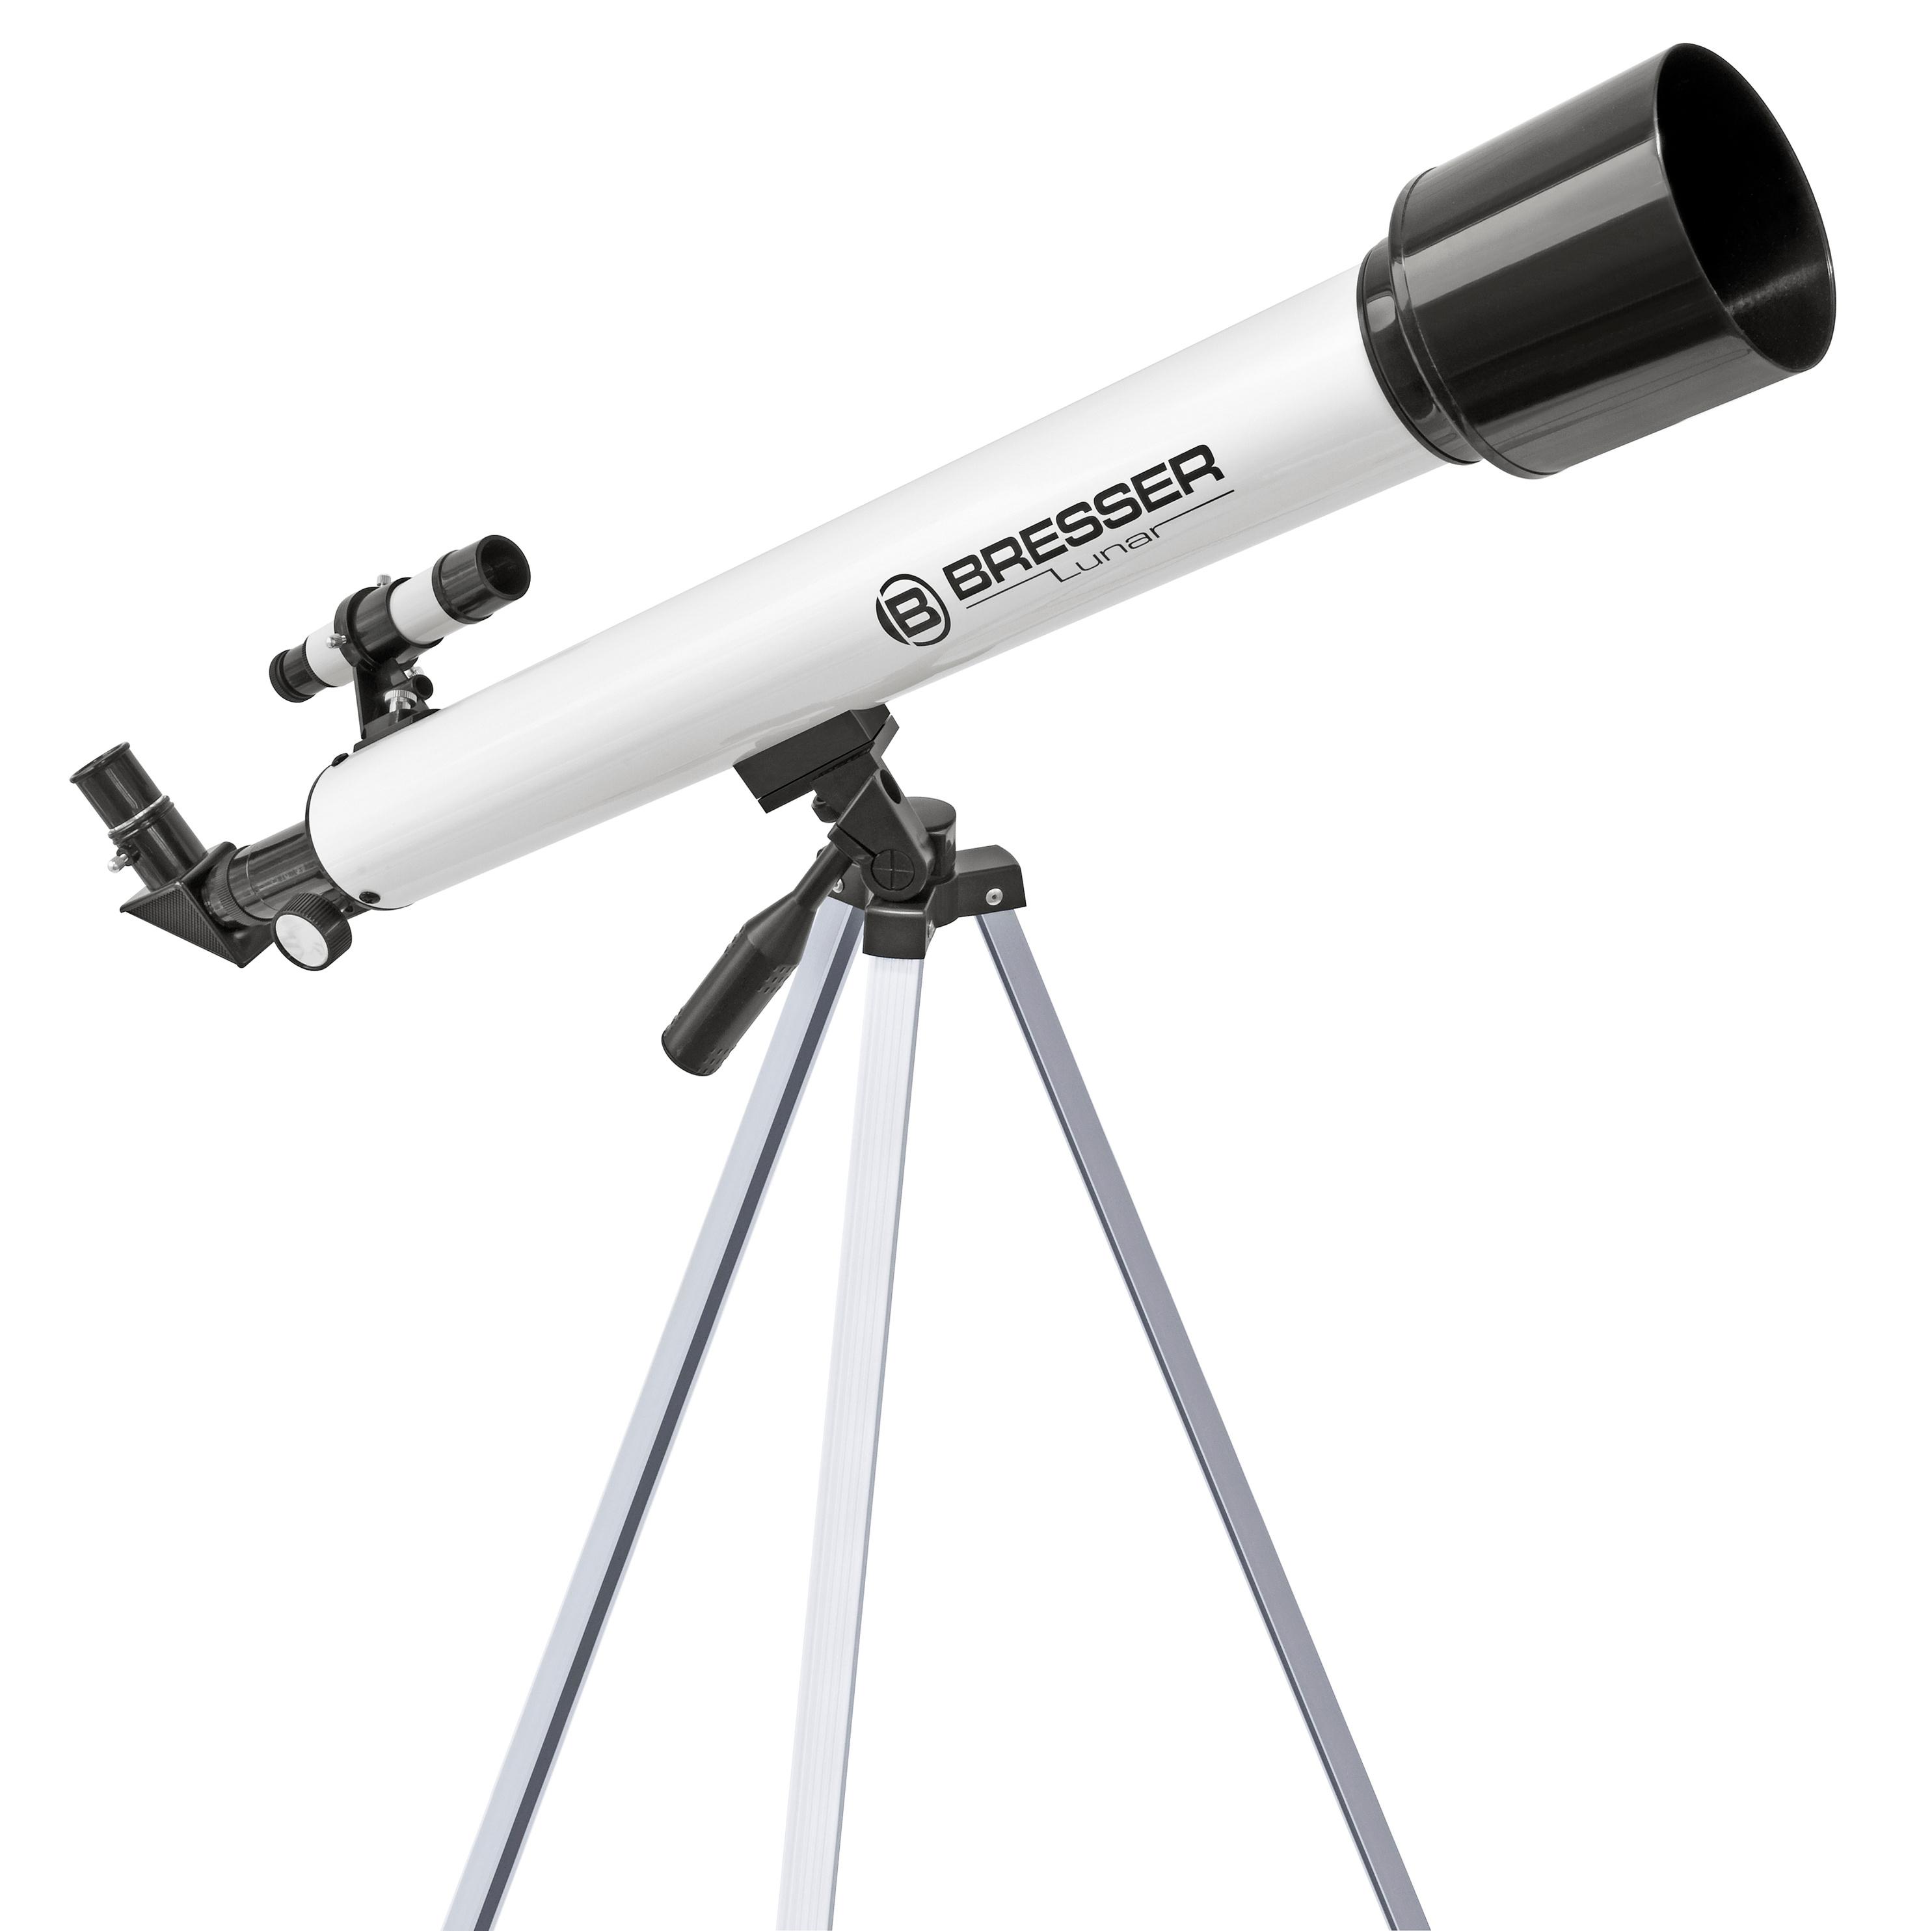 Bresser Lunar 60 700 Refraktor Teleskop Mit Stativ Weltbild De